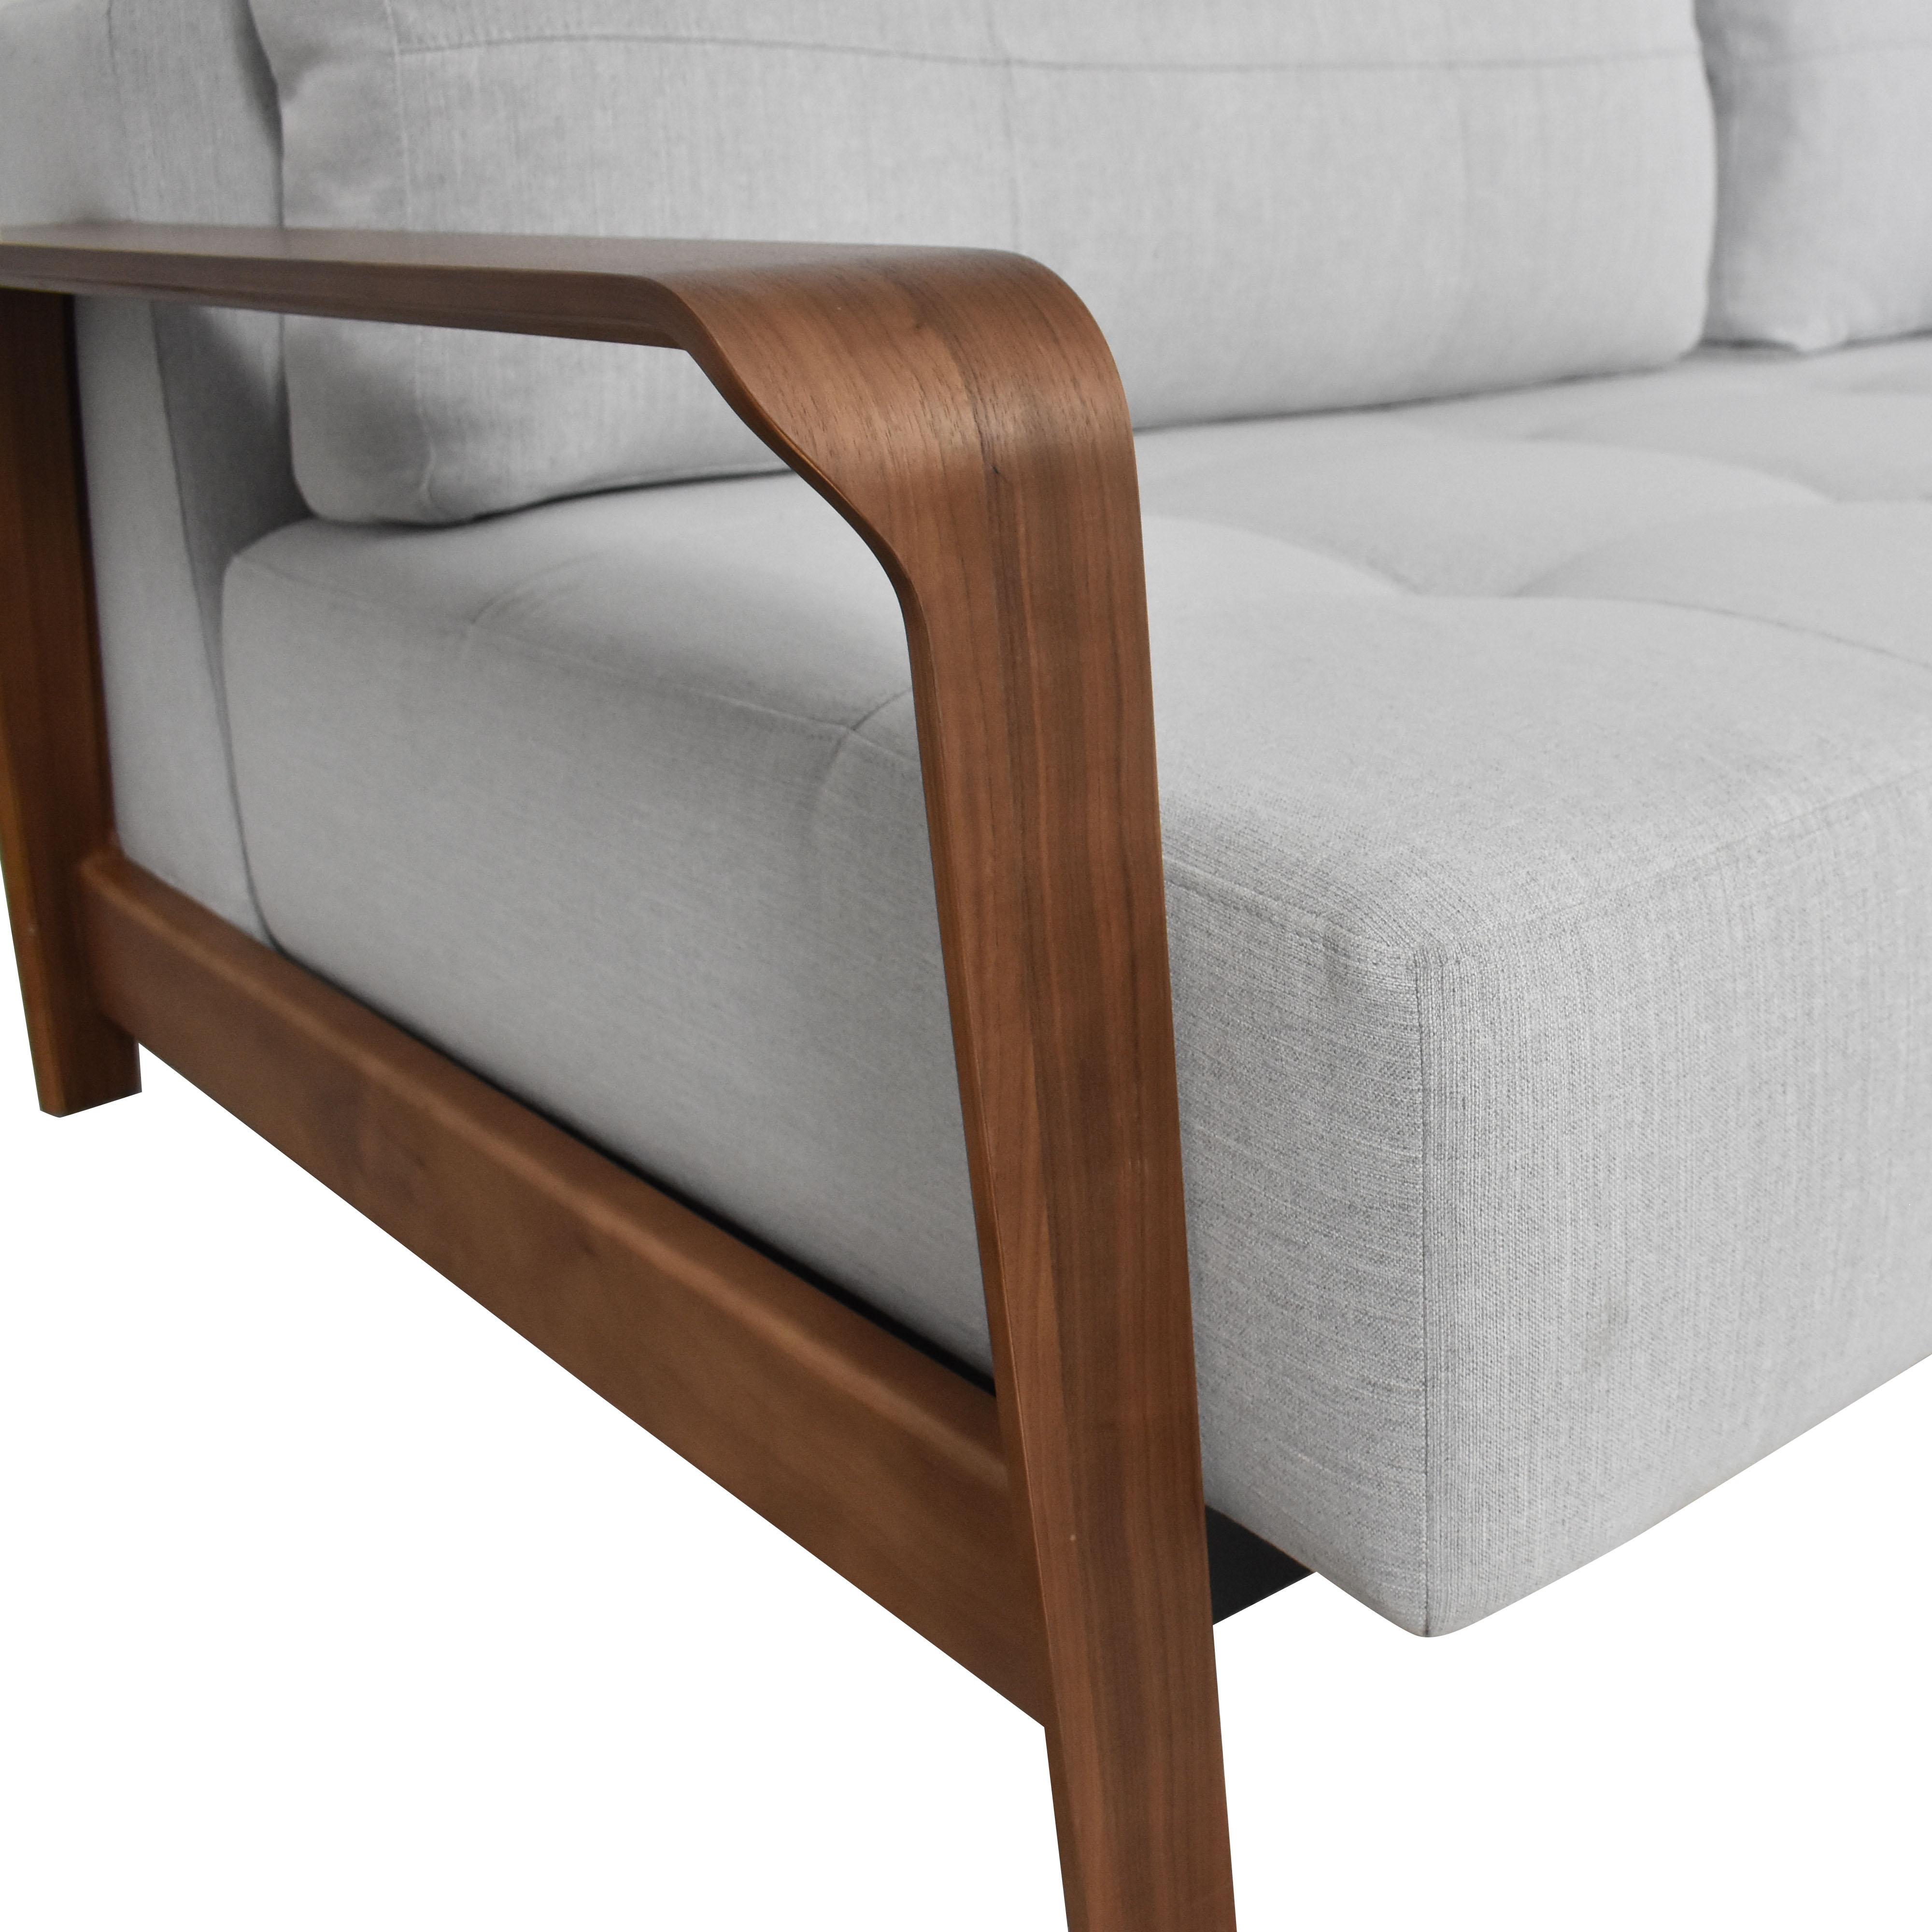 Innovation Living Innovation Living Ran Deluxe Sofa on sale